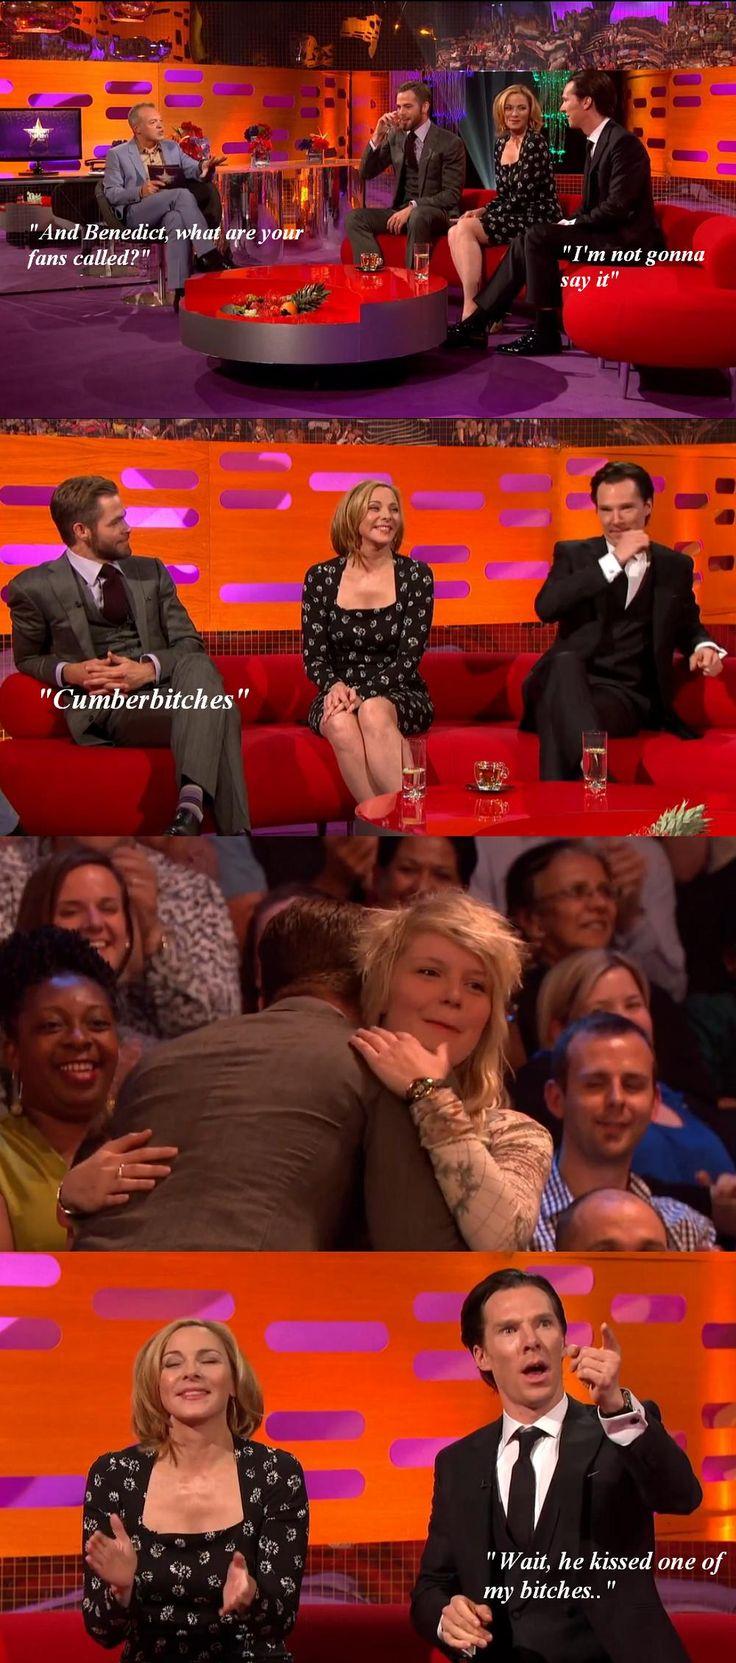 The world needs more Benedict Cumberbatch.